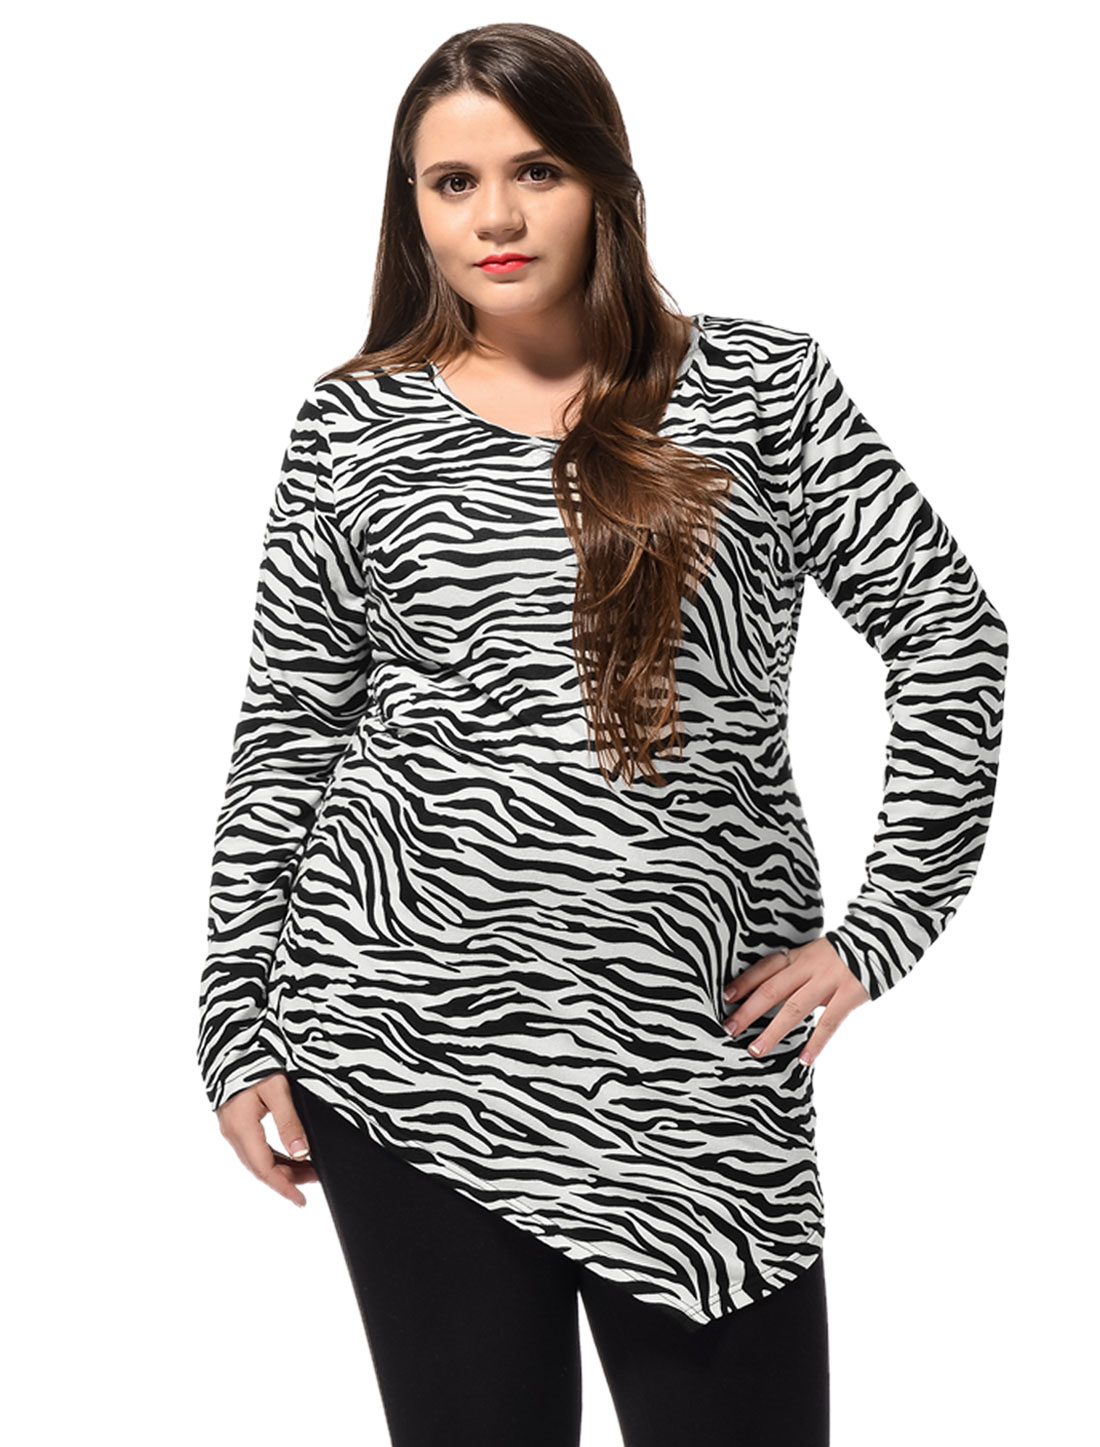 Women Plus Size Zebra Print Irregular Hem Long Sleeves Top Off White 3X